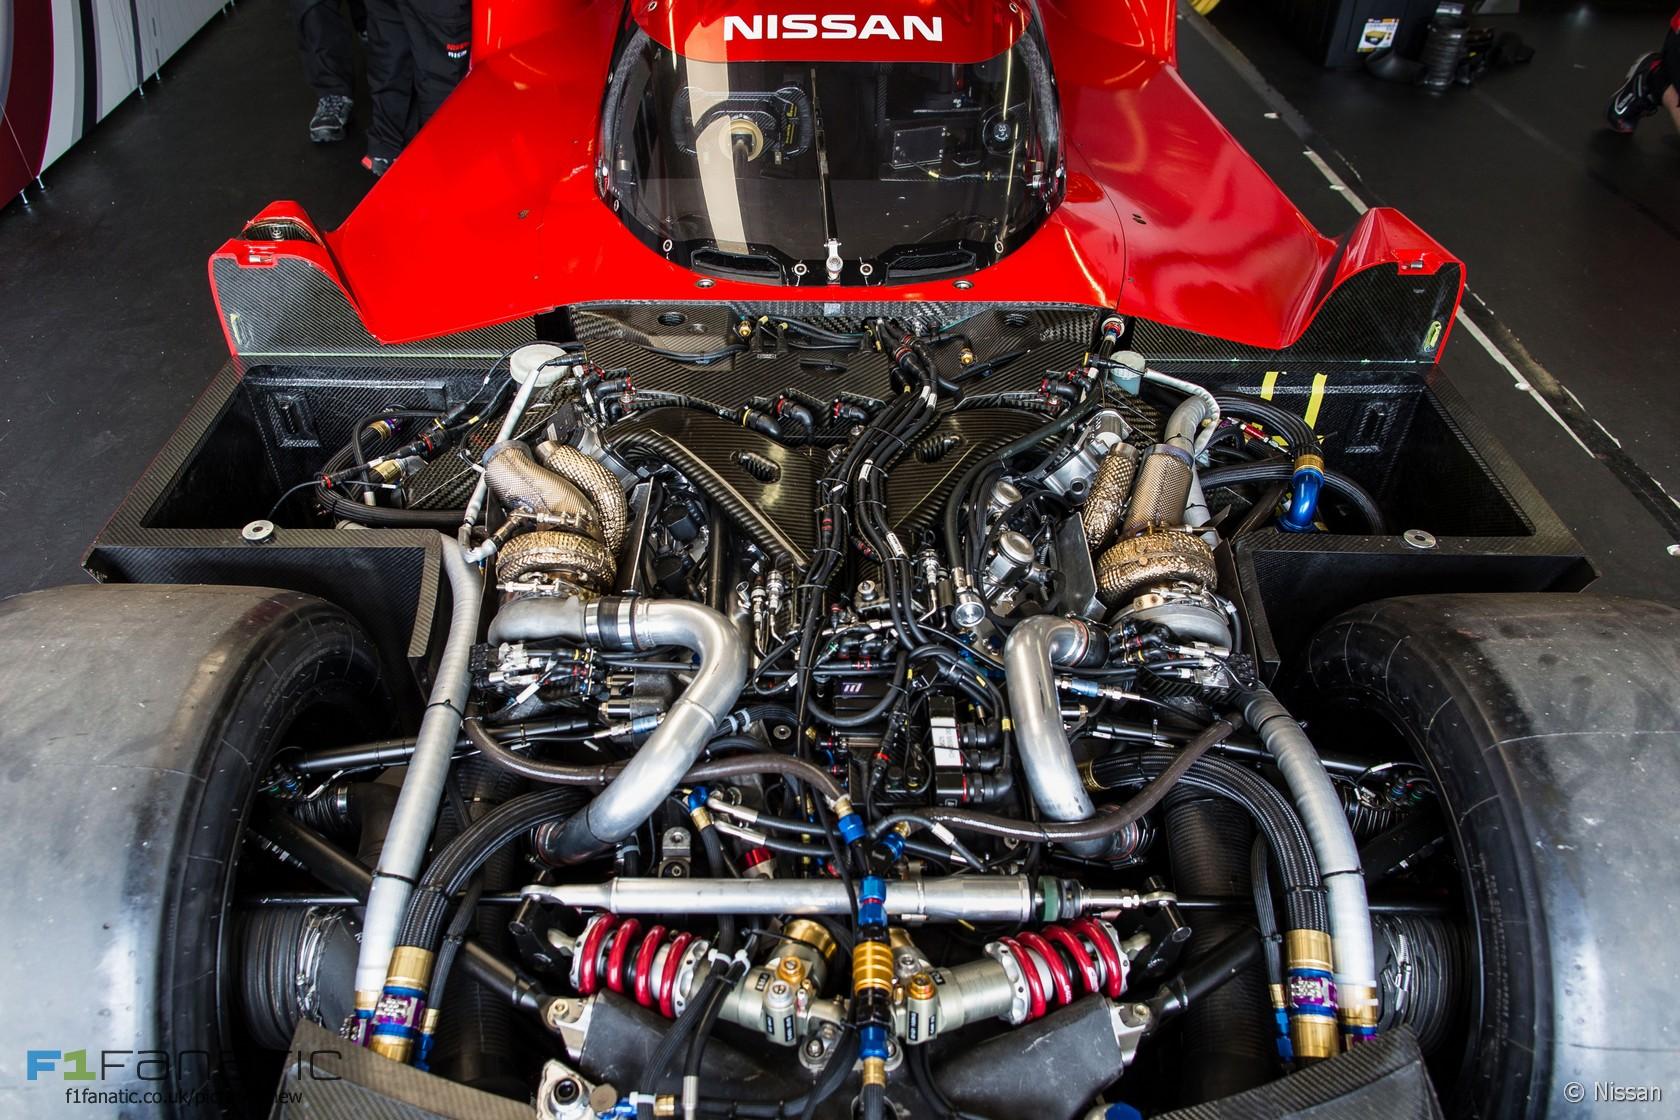 Nissan lemans engine